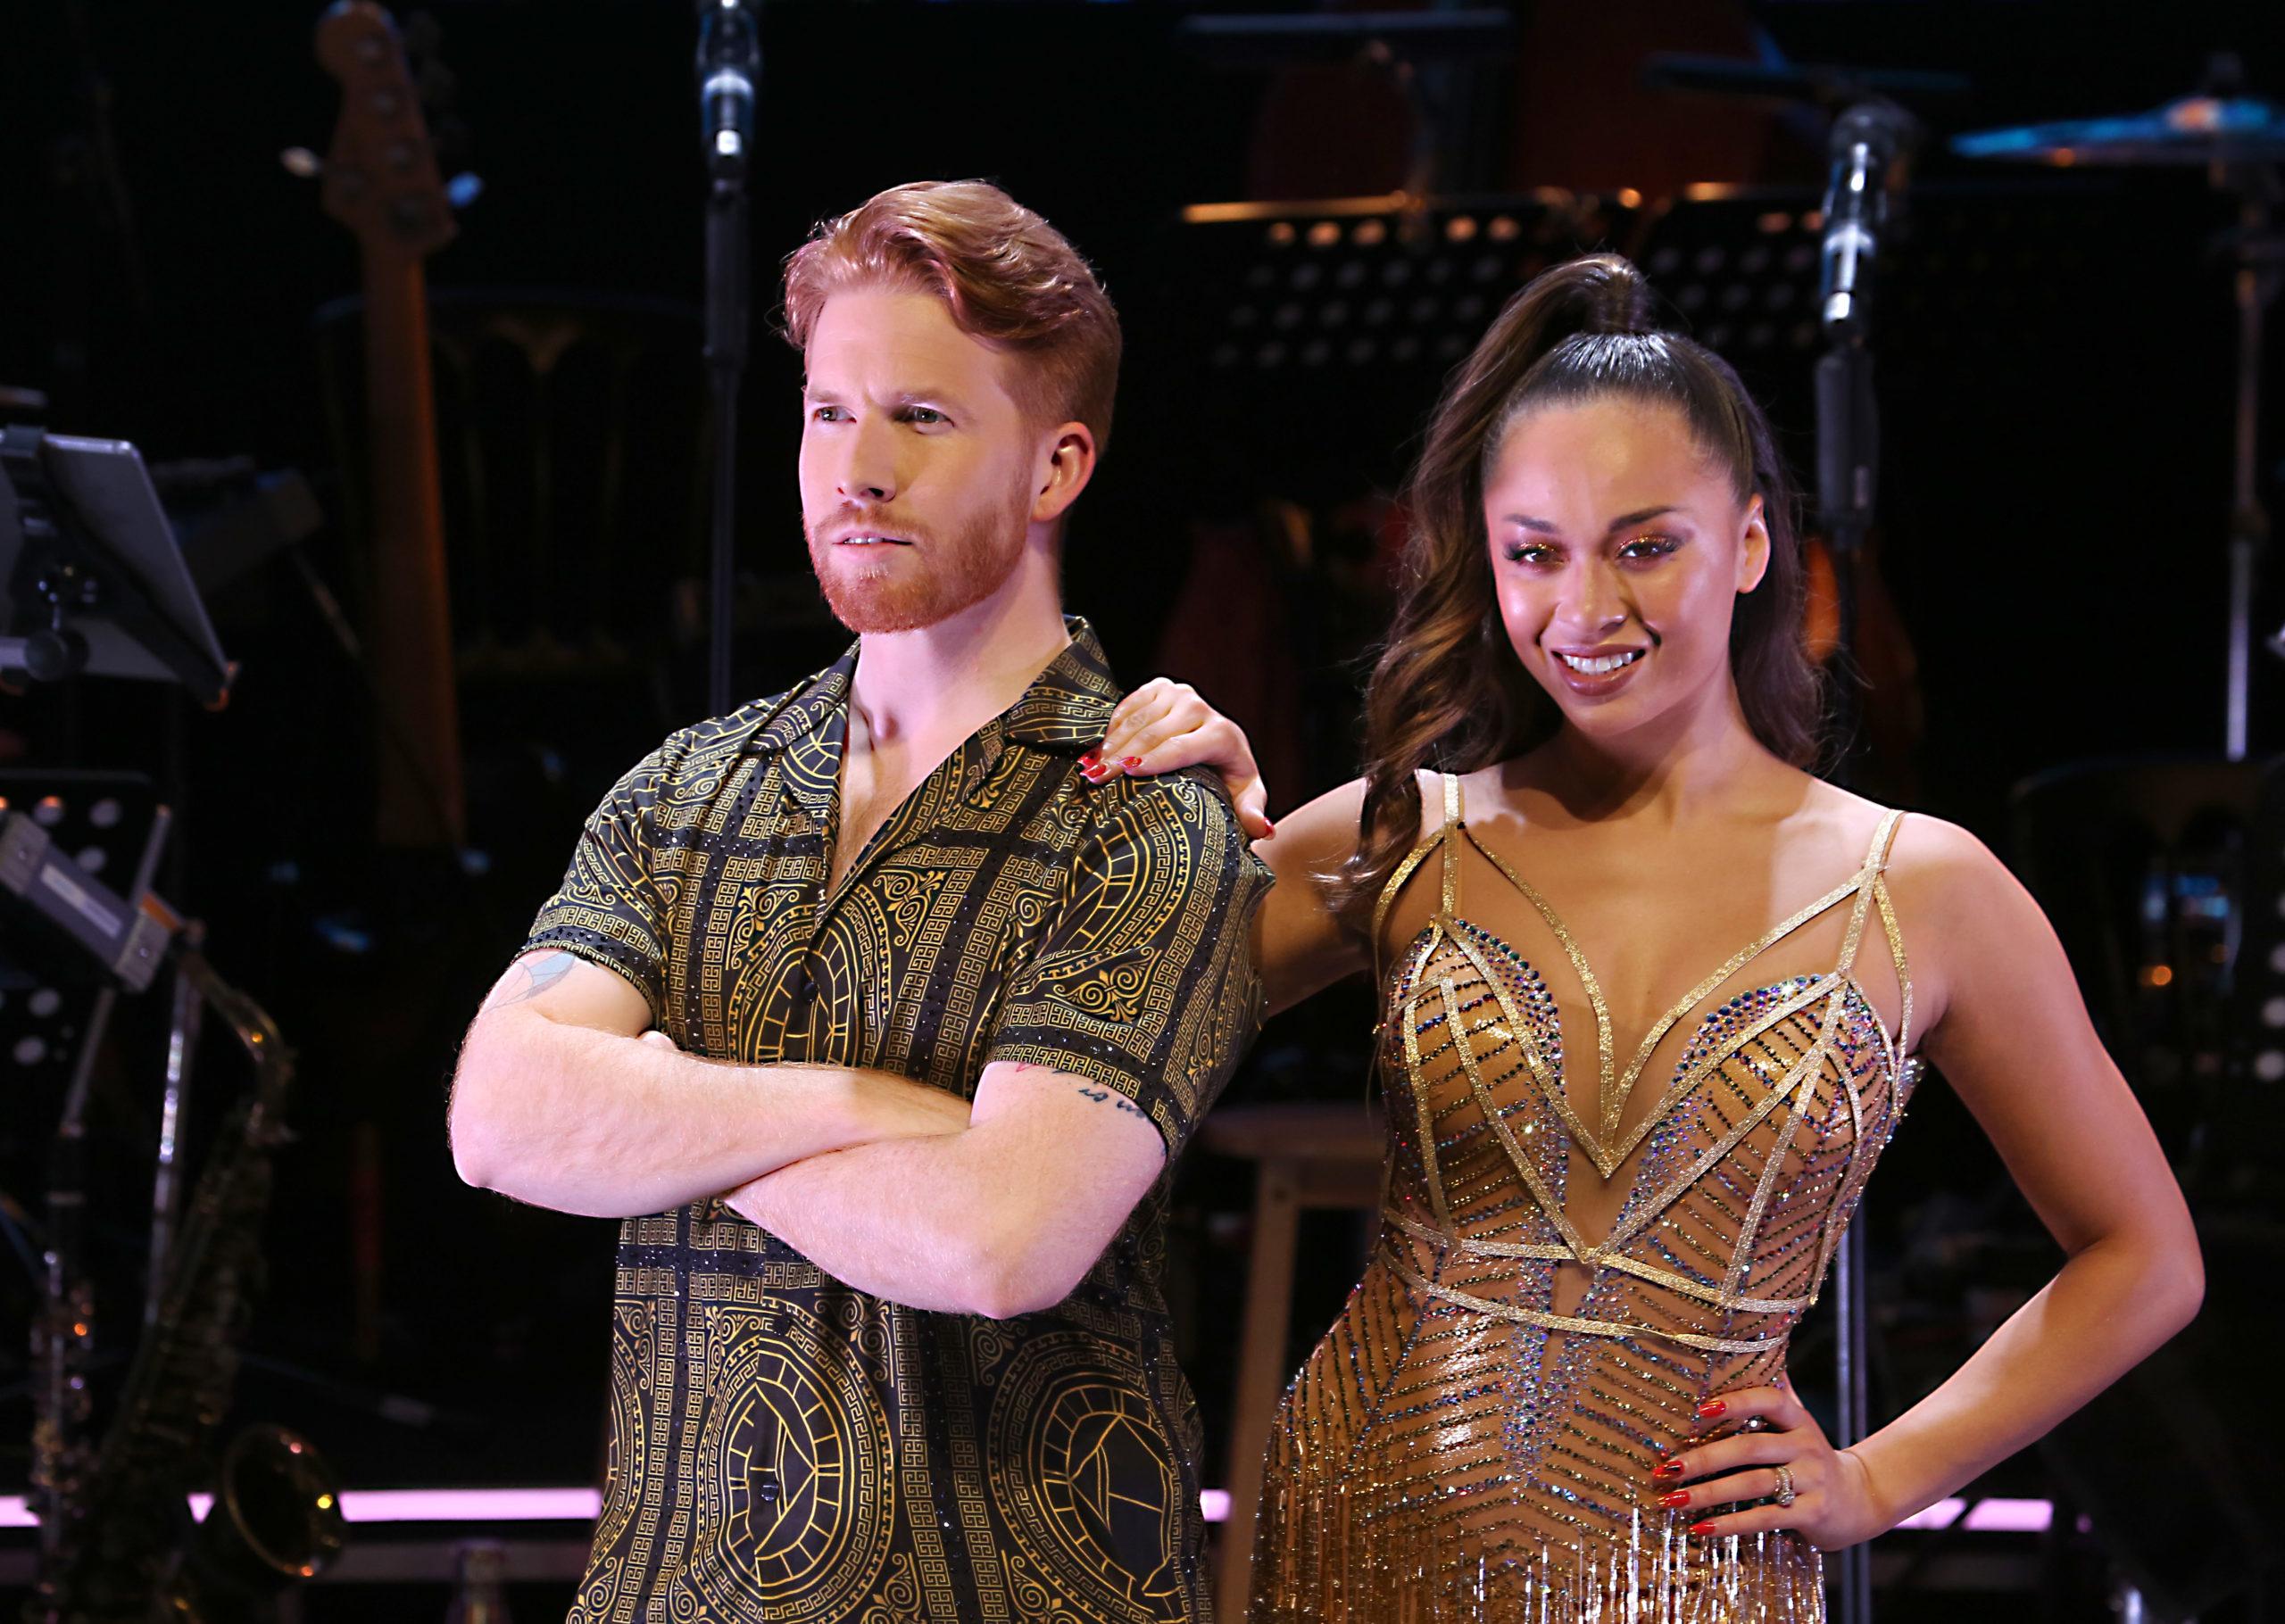 Neil Scott will watch ex wife Katya compete